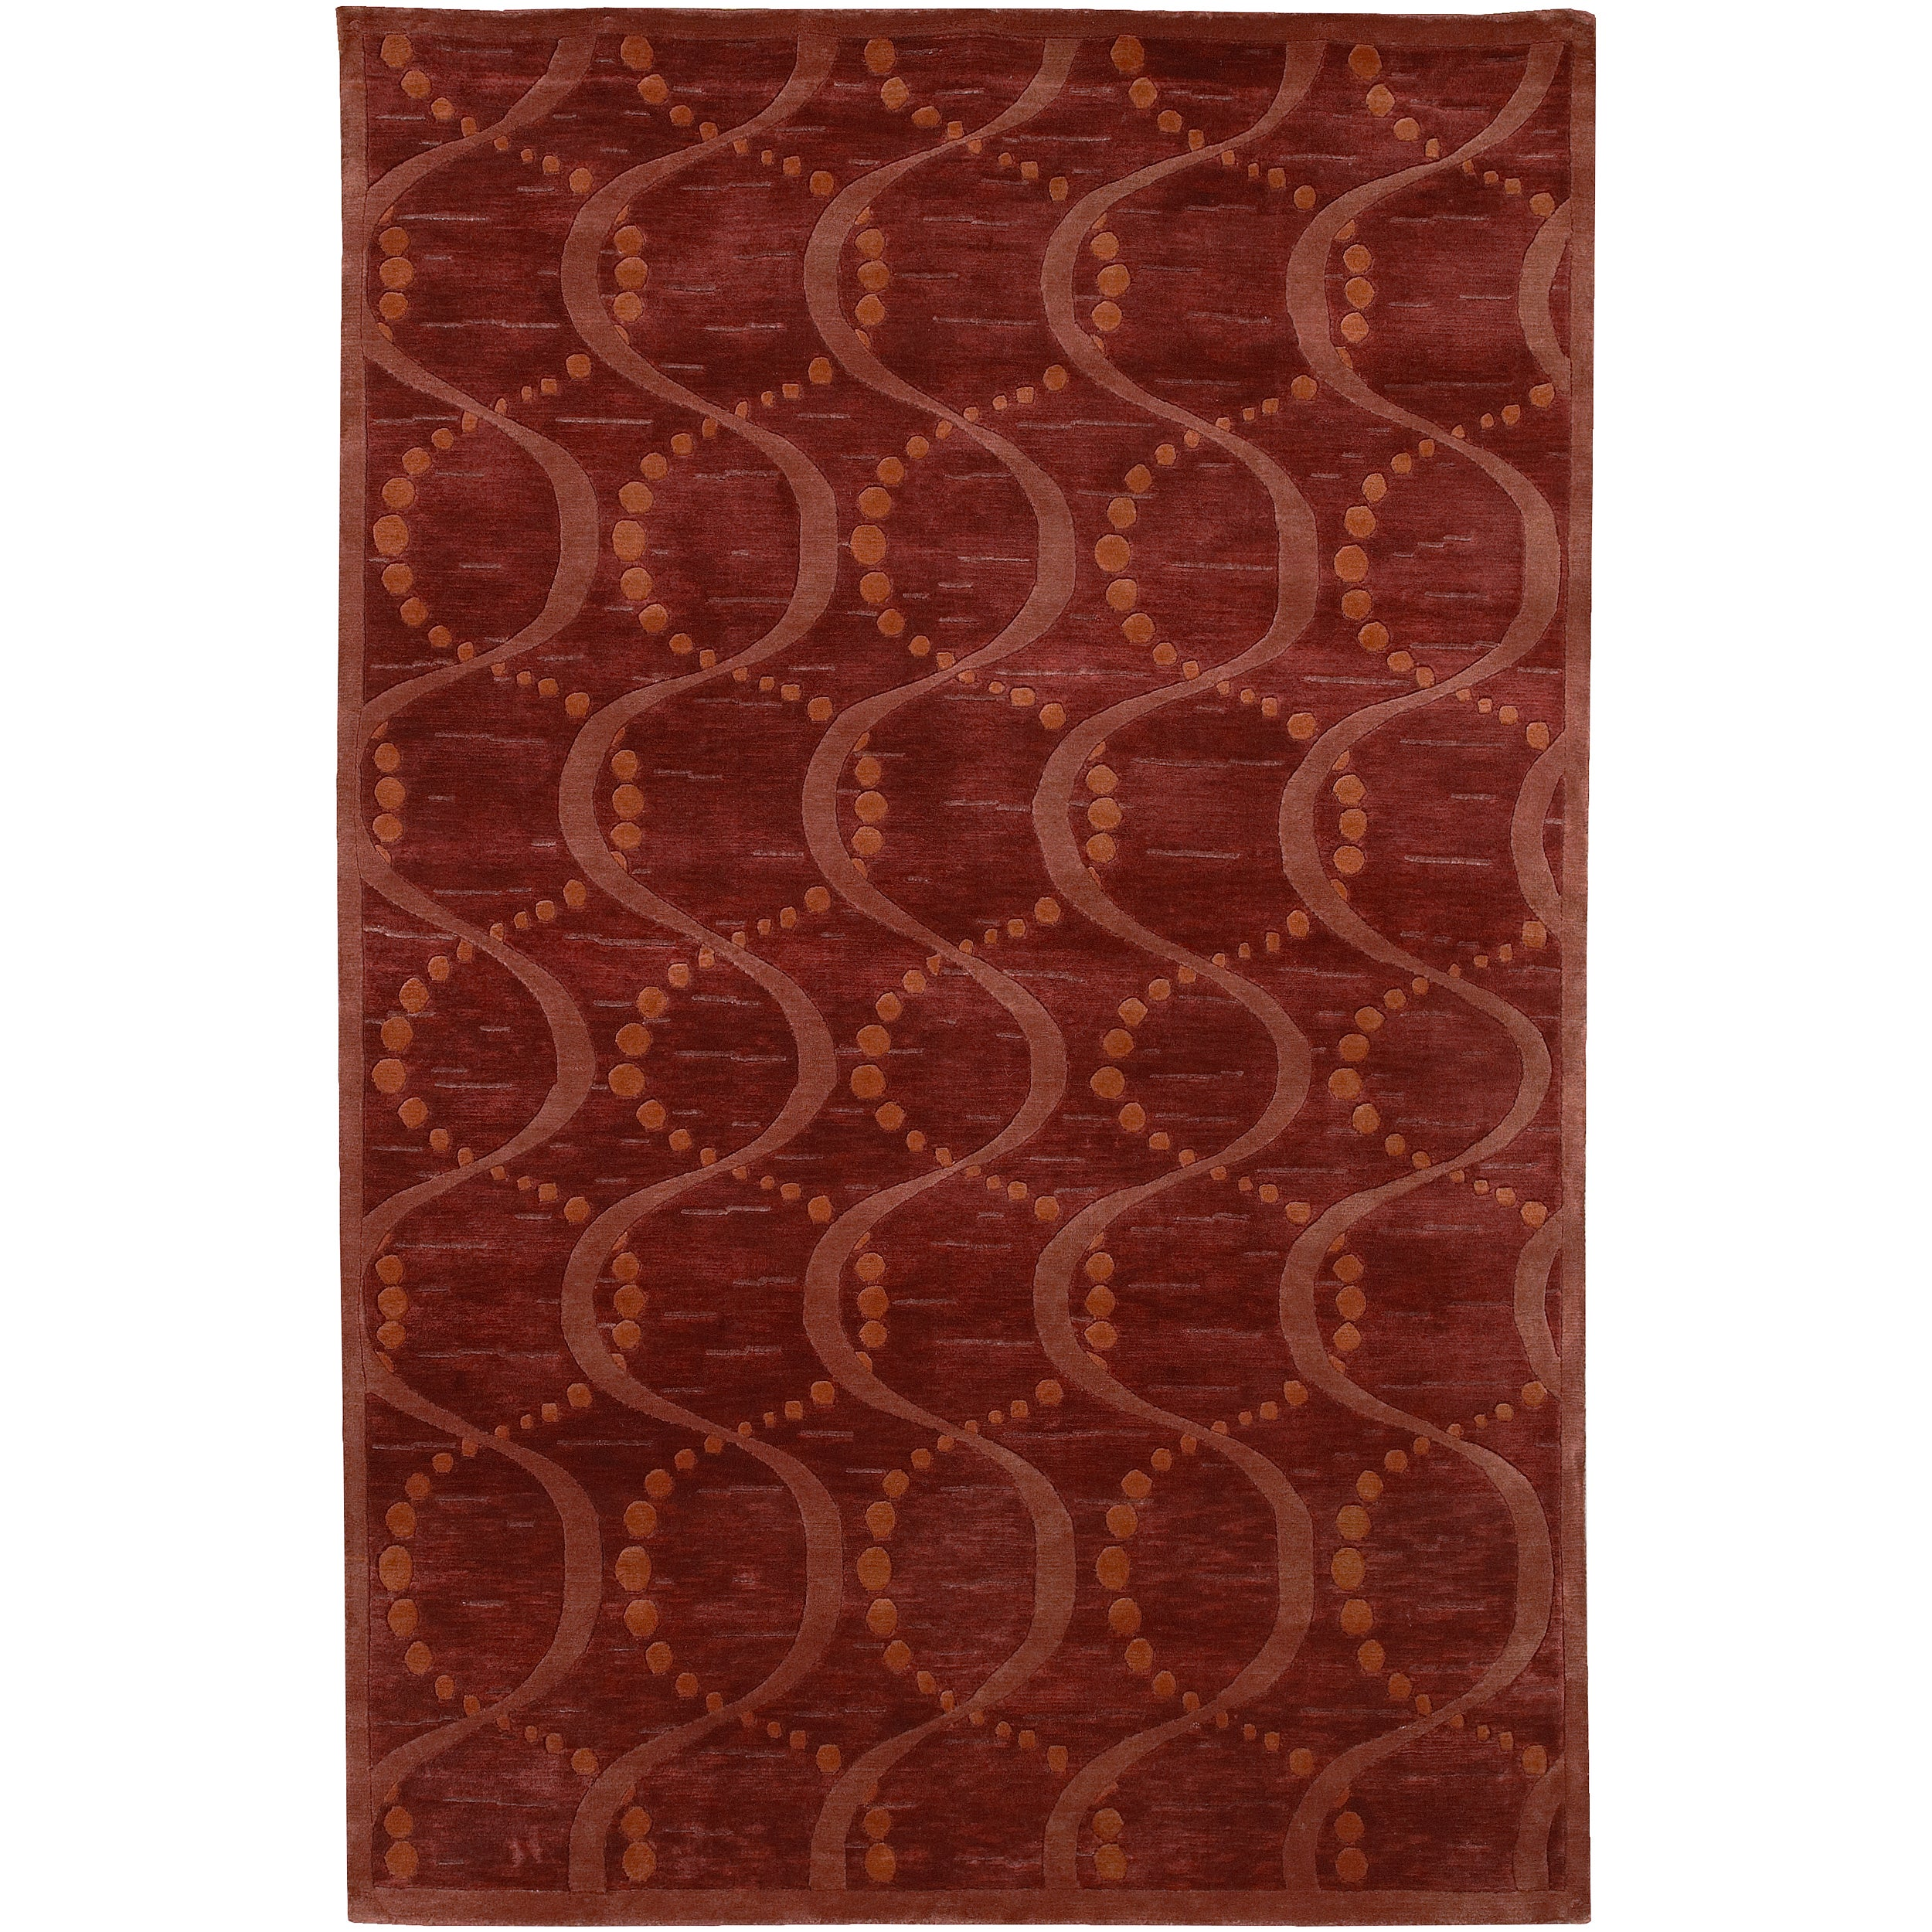 Hand-Knotted Multicolored La Crosse Geometric Semi-Worsted Wool Area Rug - 5' x 8'